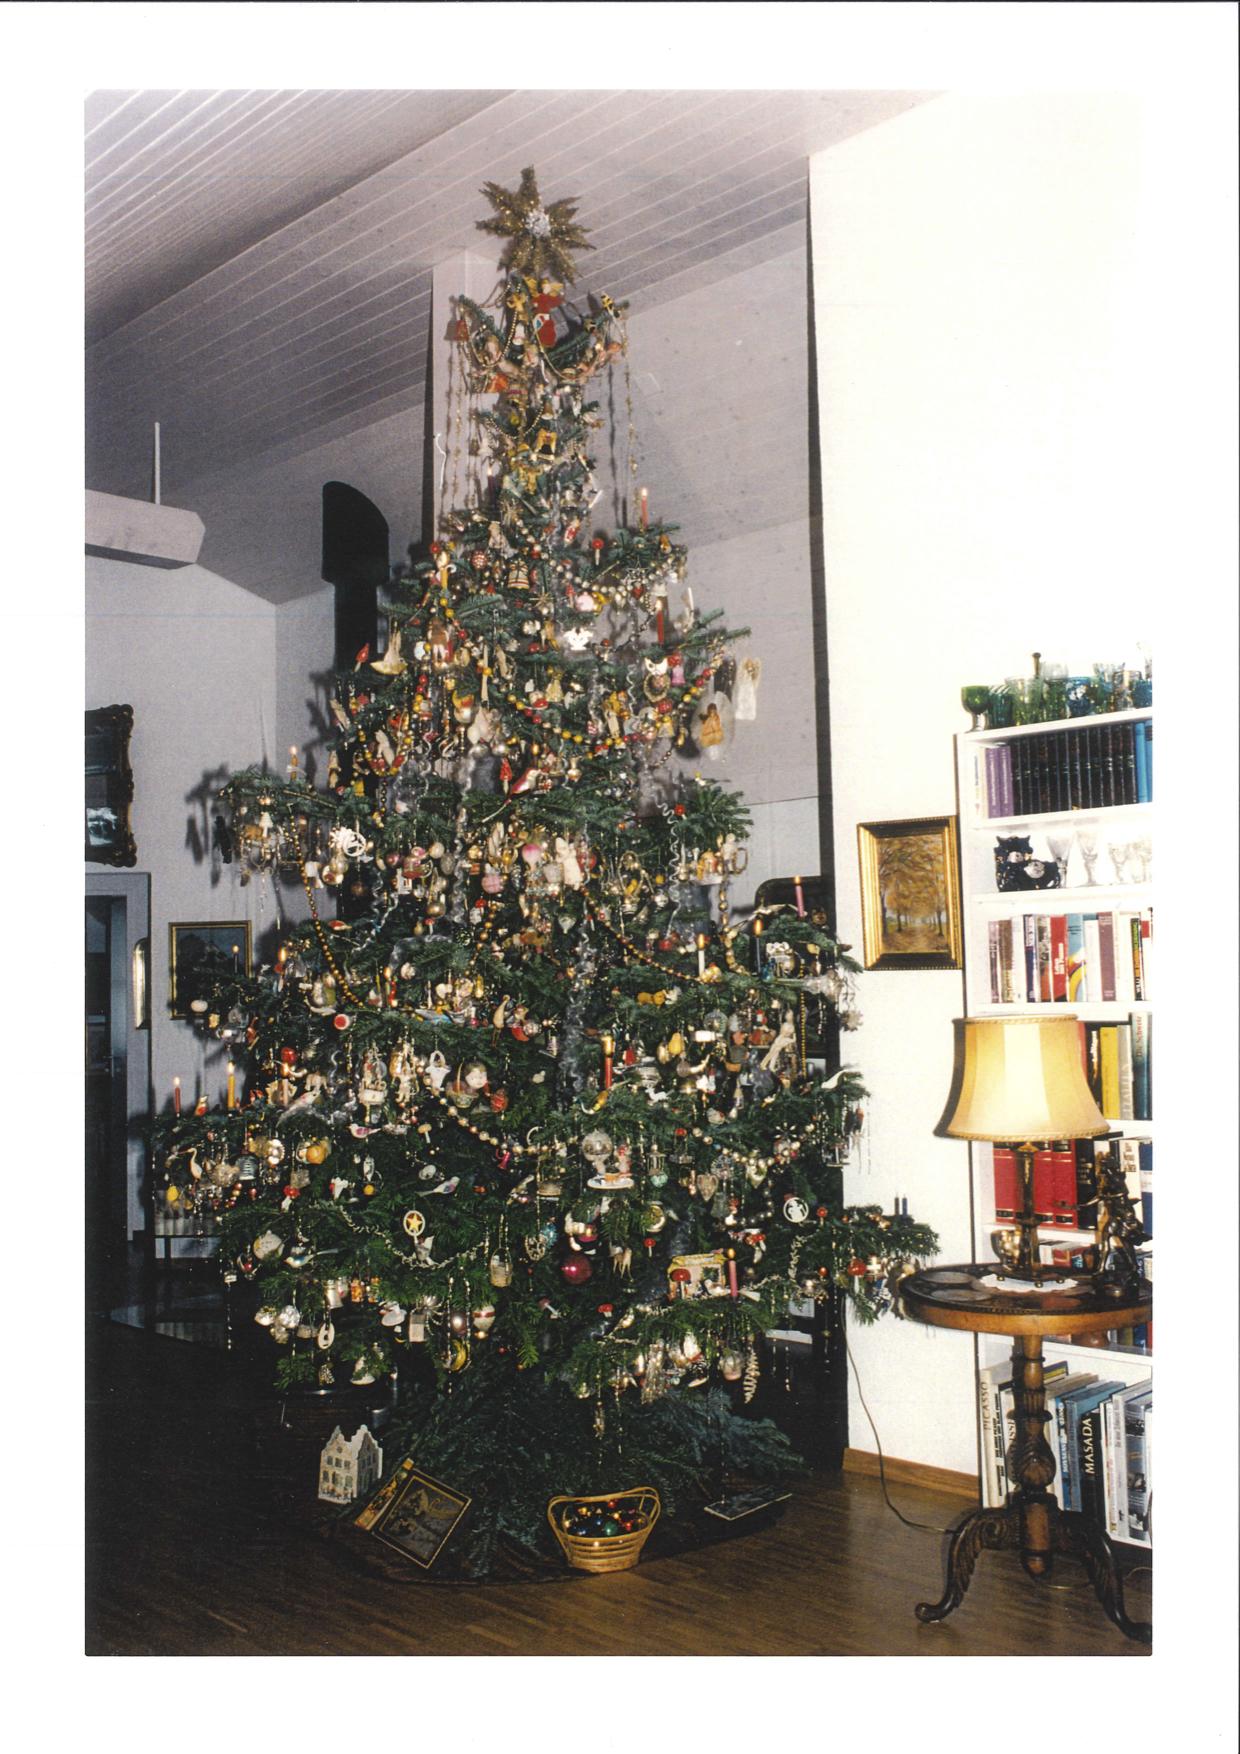 Weihnachtsbaum Engelshaar.Engelshaar Christbaum Sammlung Hanne Pohl